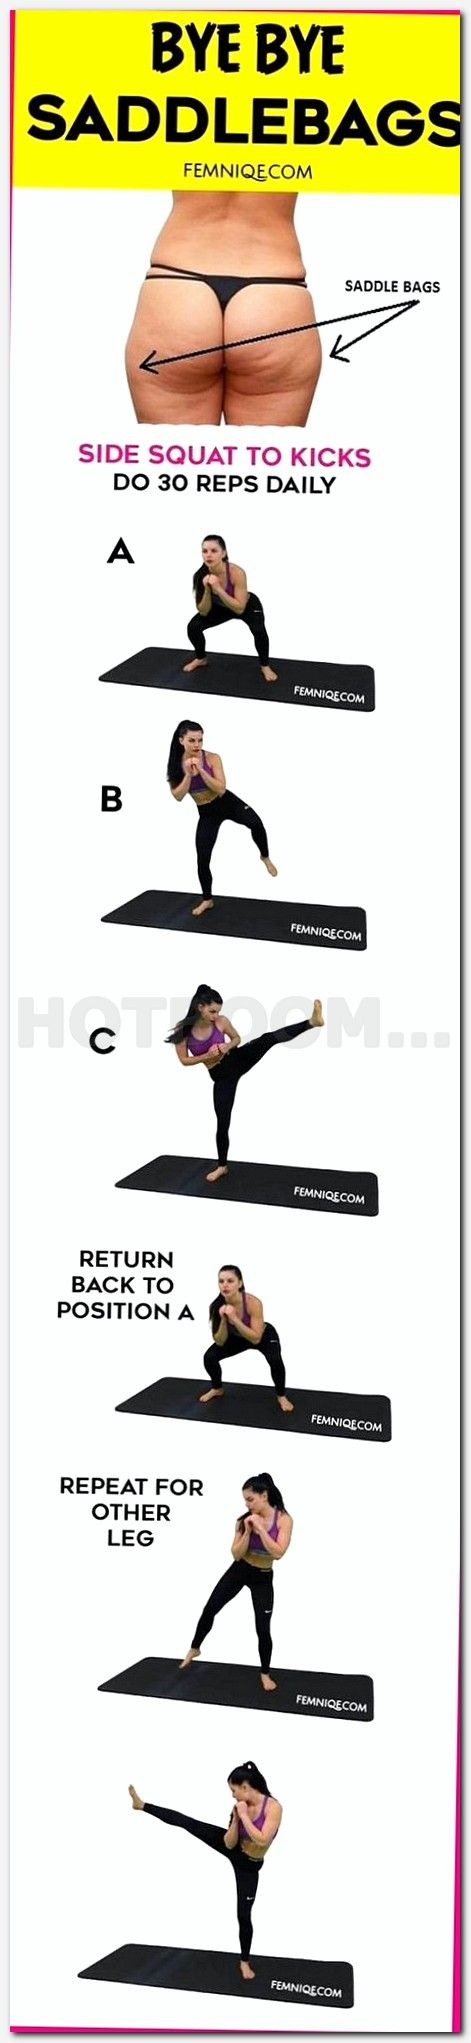 25+ best ideas about Yoga poses chart on Pinterest | Yoga ...